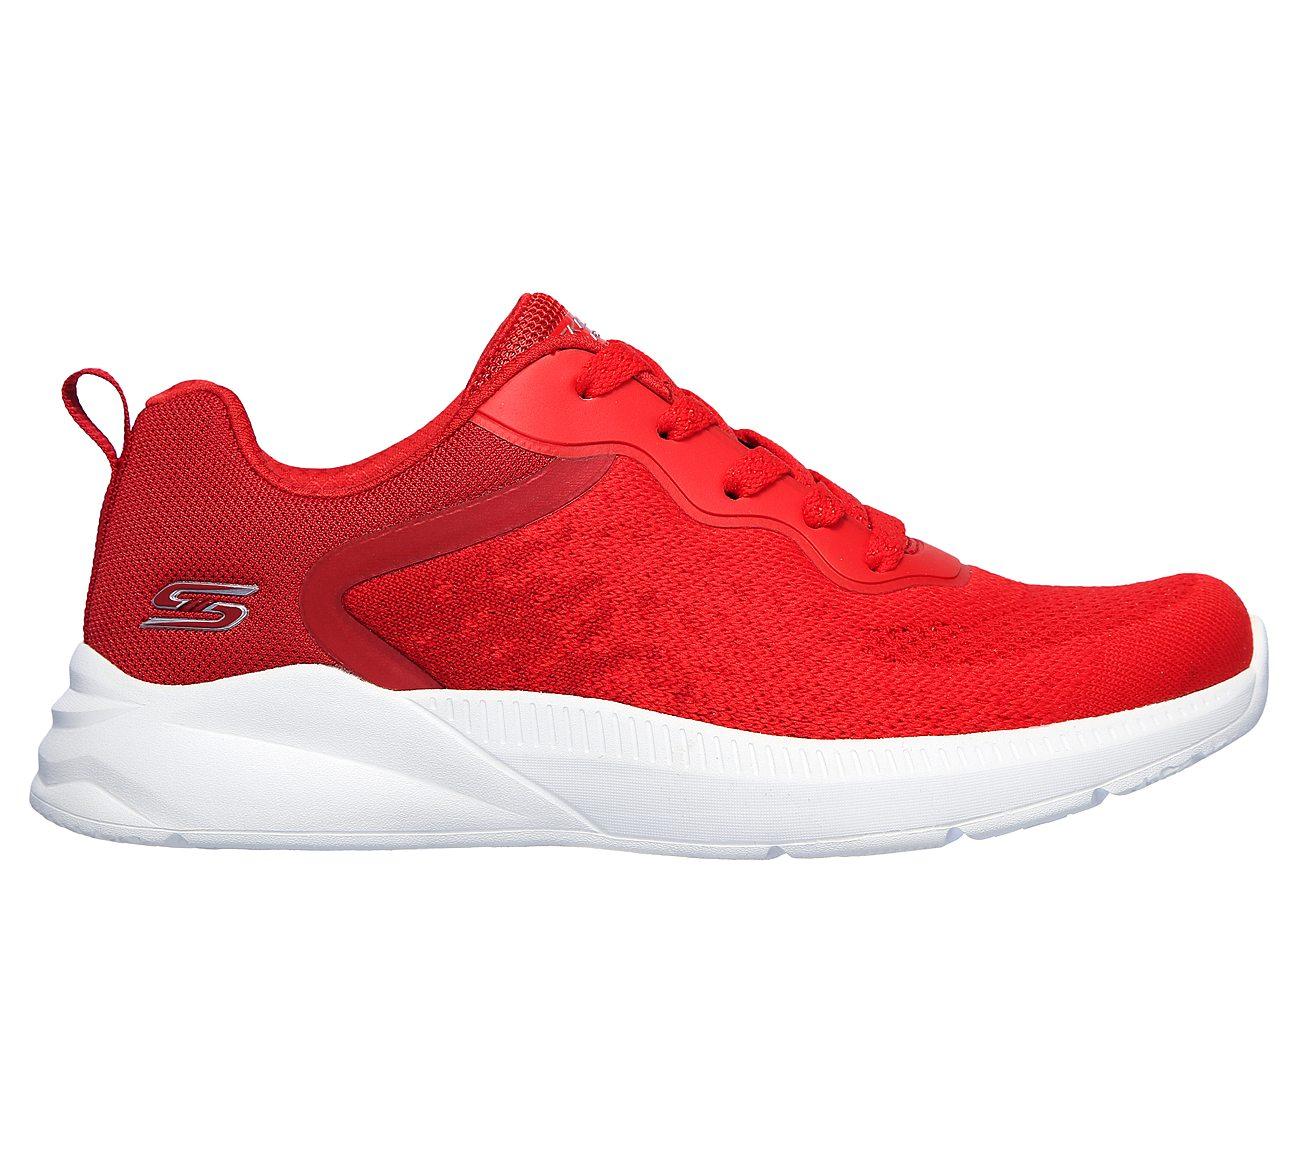 Buy SKECHERS BOBS Sport Ariana Metro Racket Bobs Shoes OQLfY